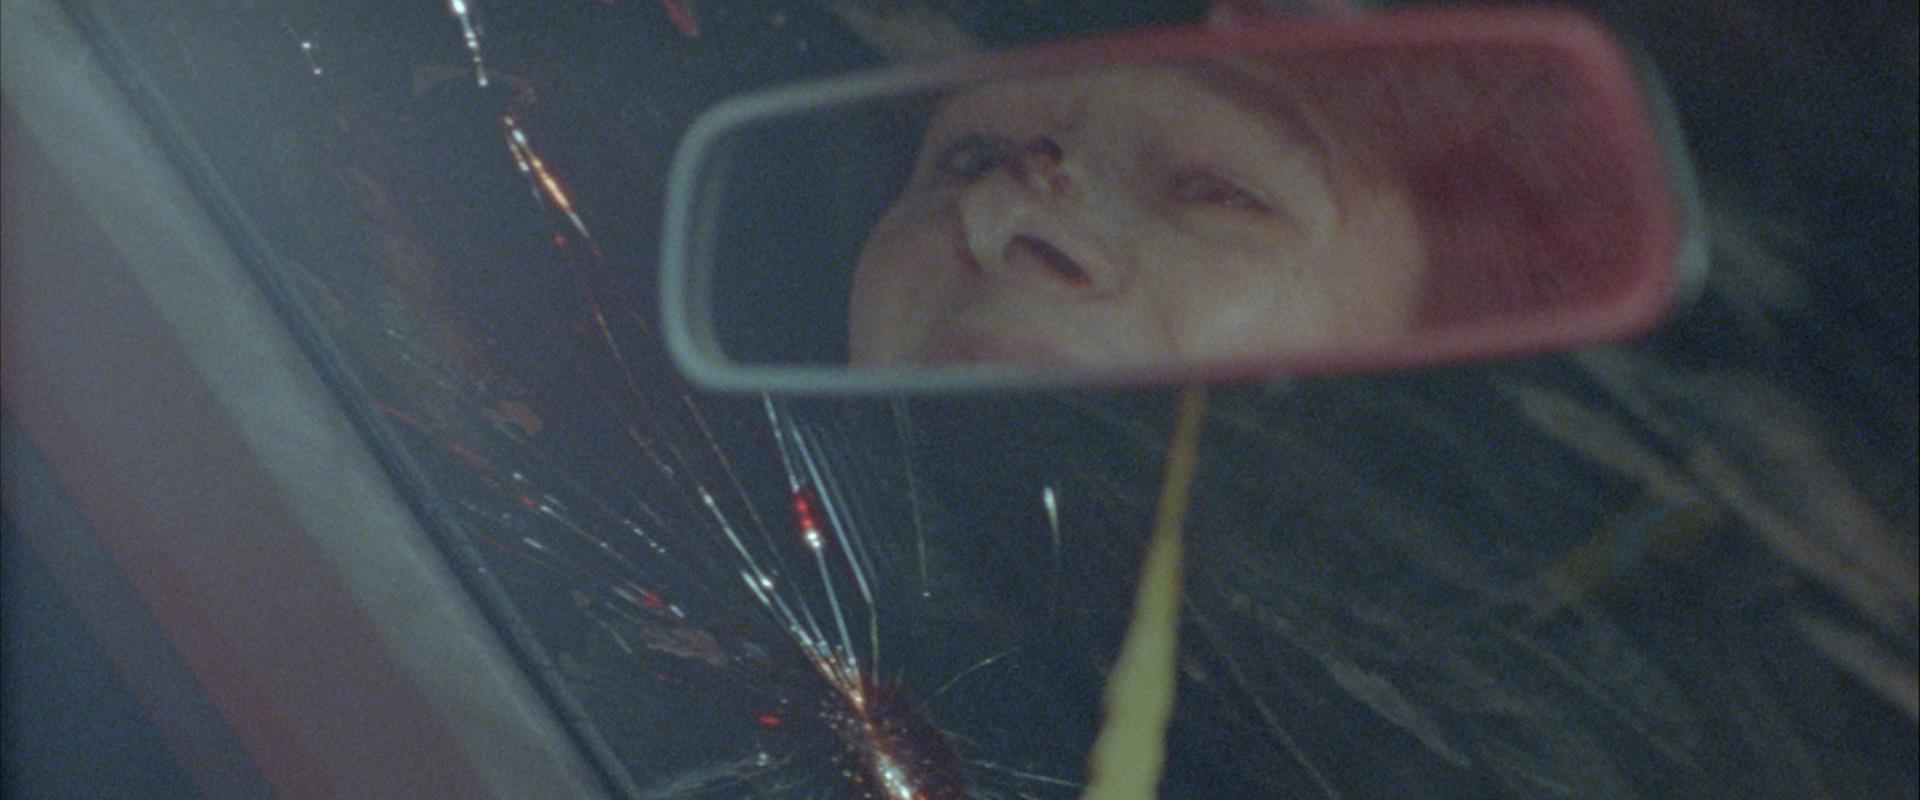 Driver Passenger - Still 5.jpg